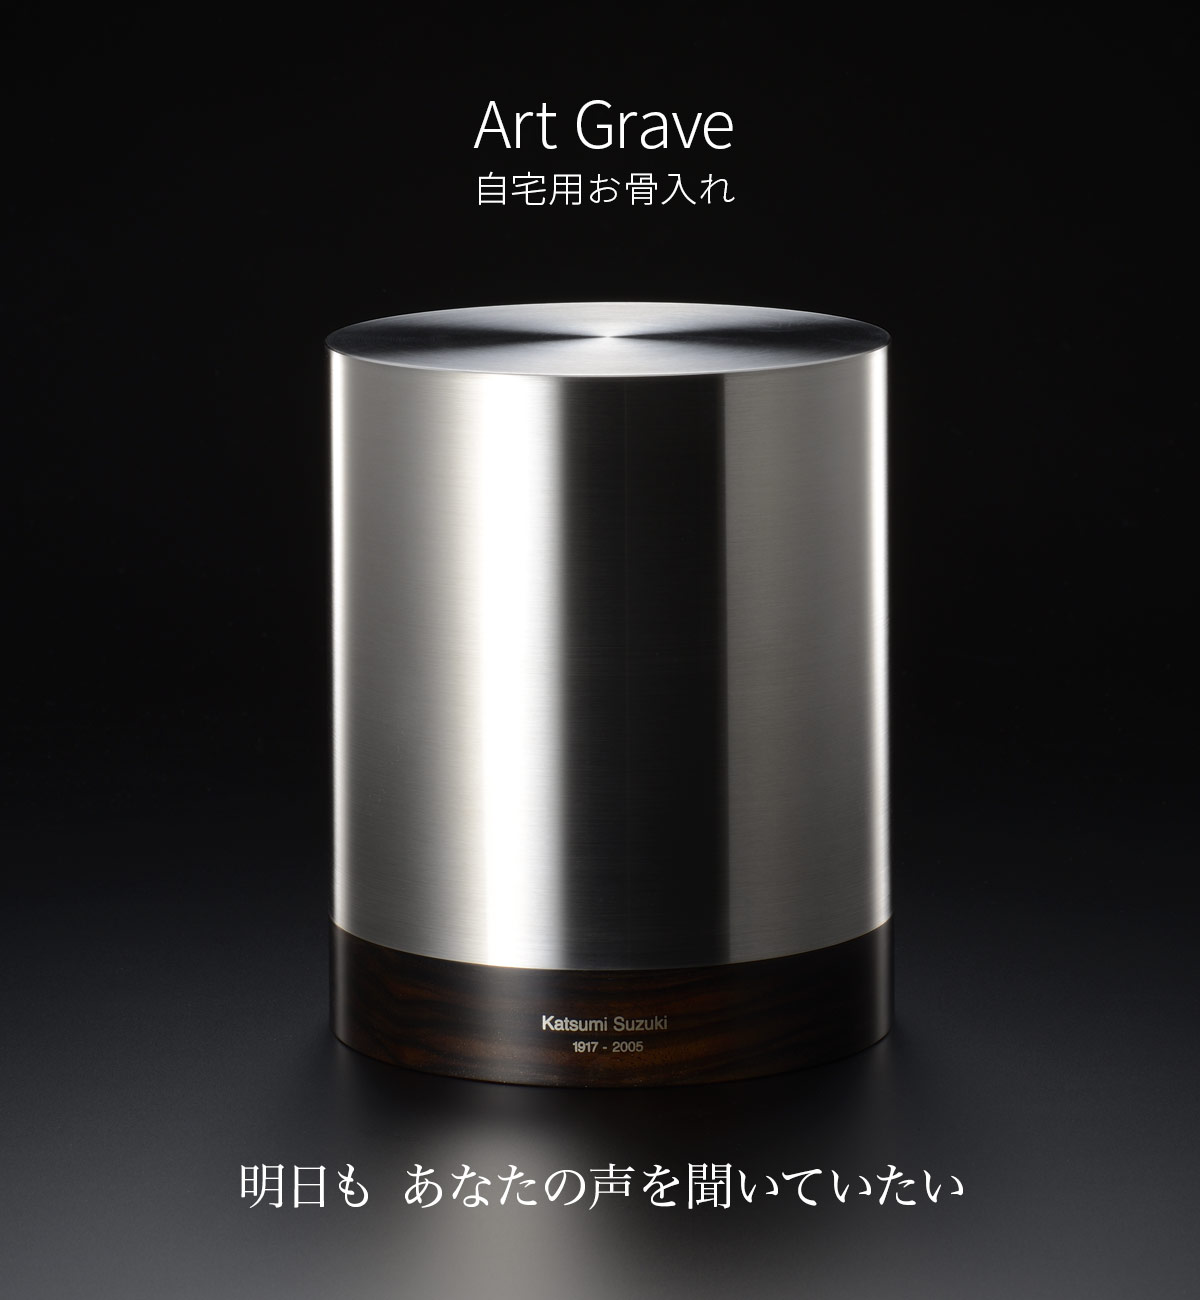 MUONのインテリア骨壷「Art Grave」